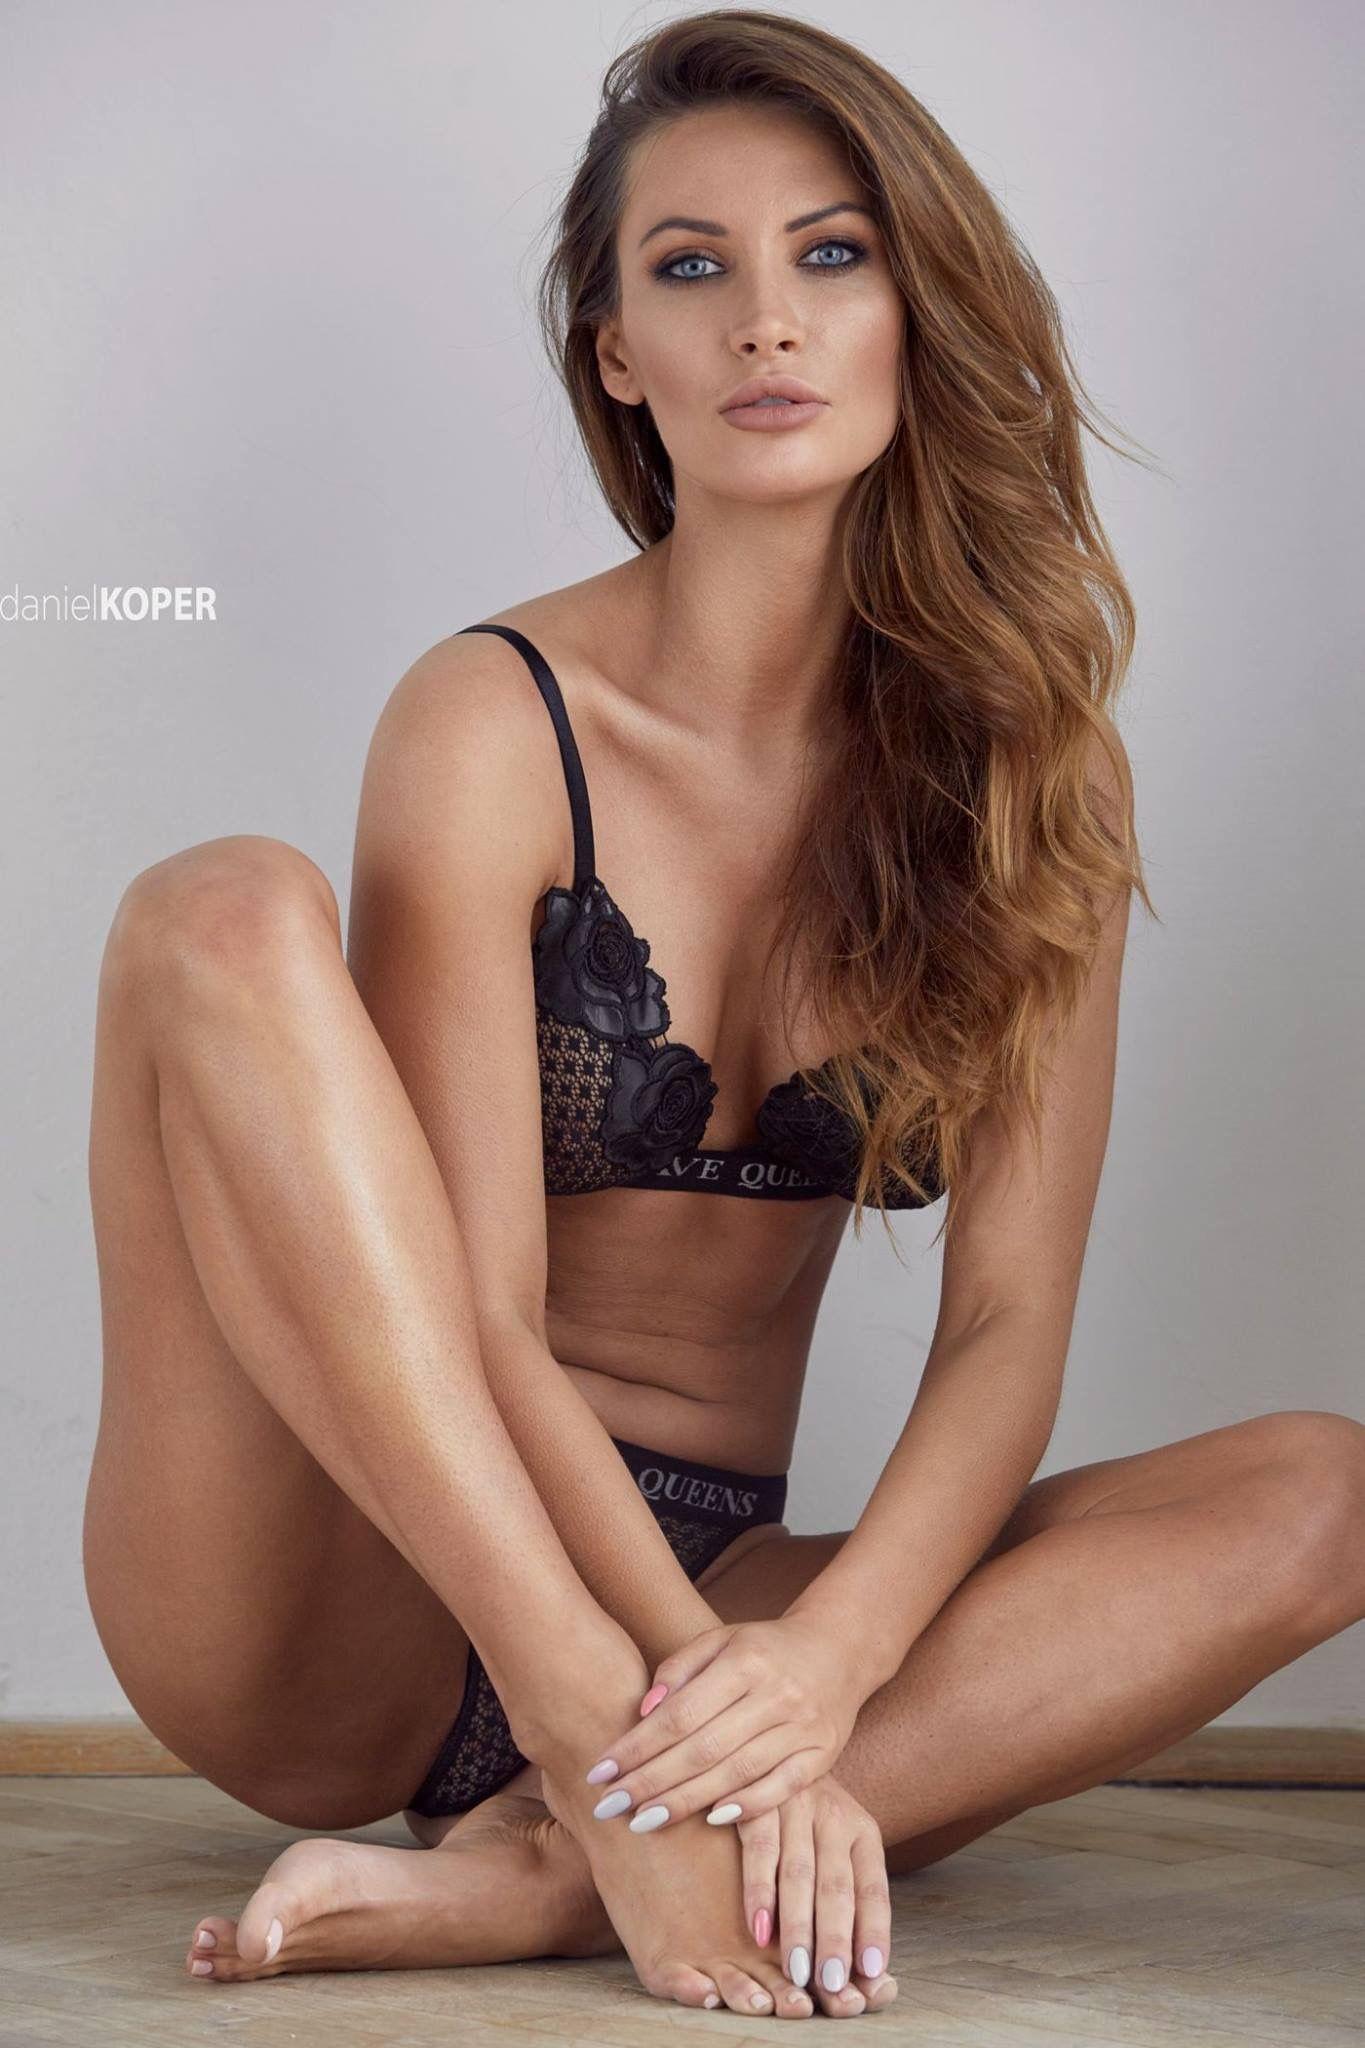 Karolina Wozniak nudes (25 pics), Is a cute Ass, Snapchat, legs 2018